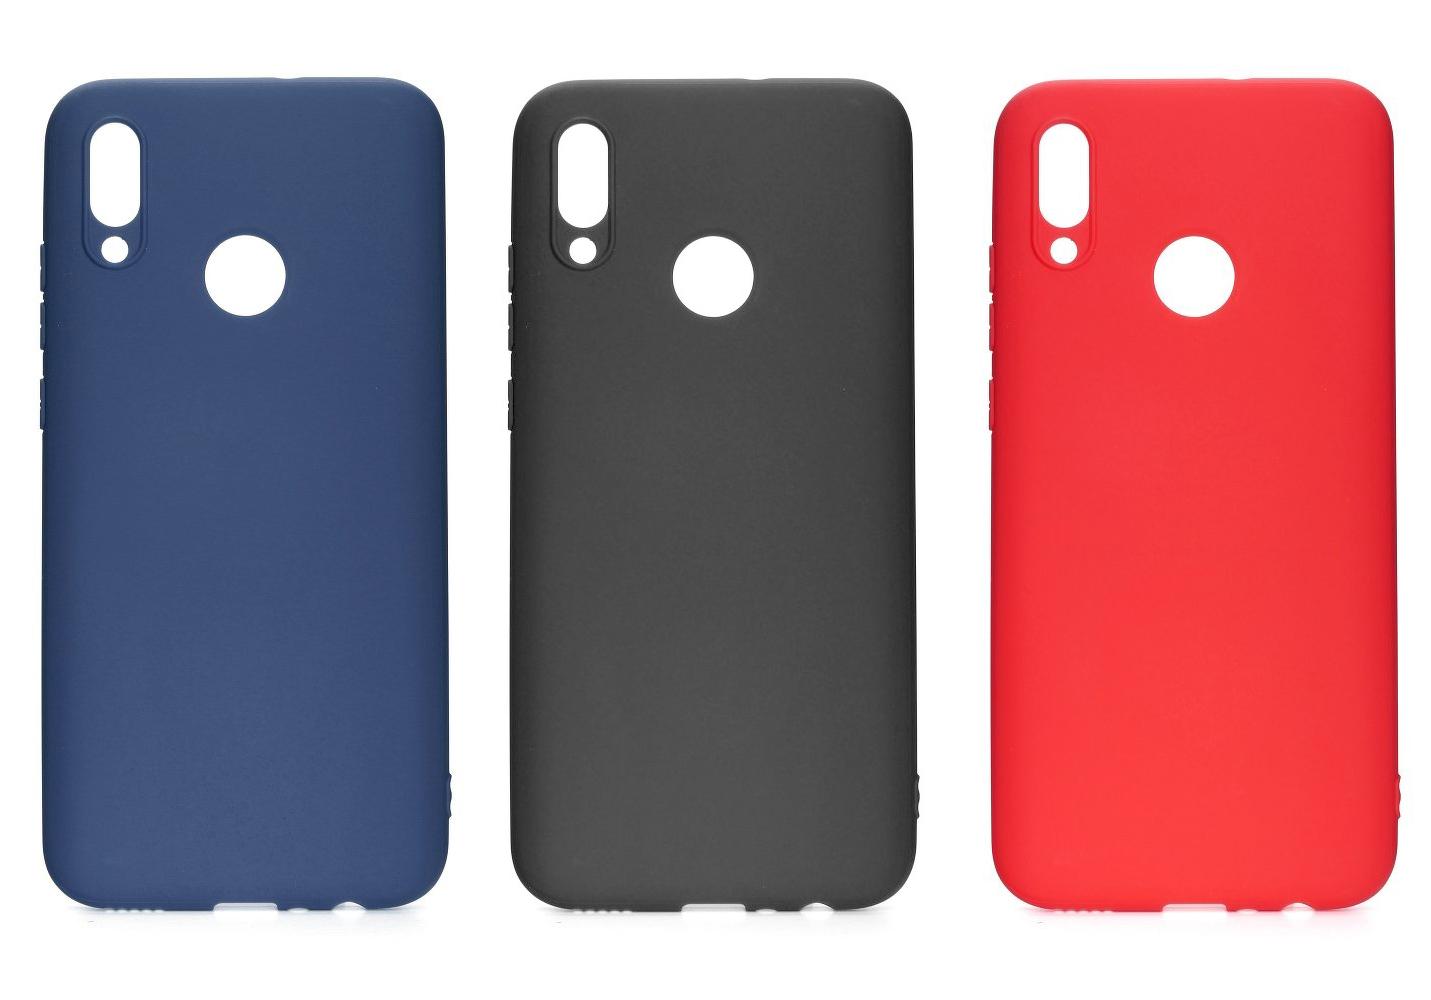 capas finas silicone Huawei P Smart 2019